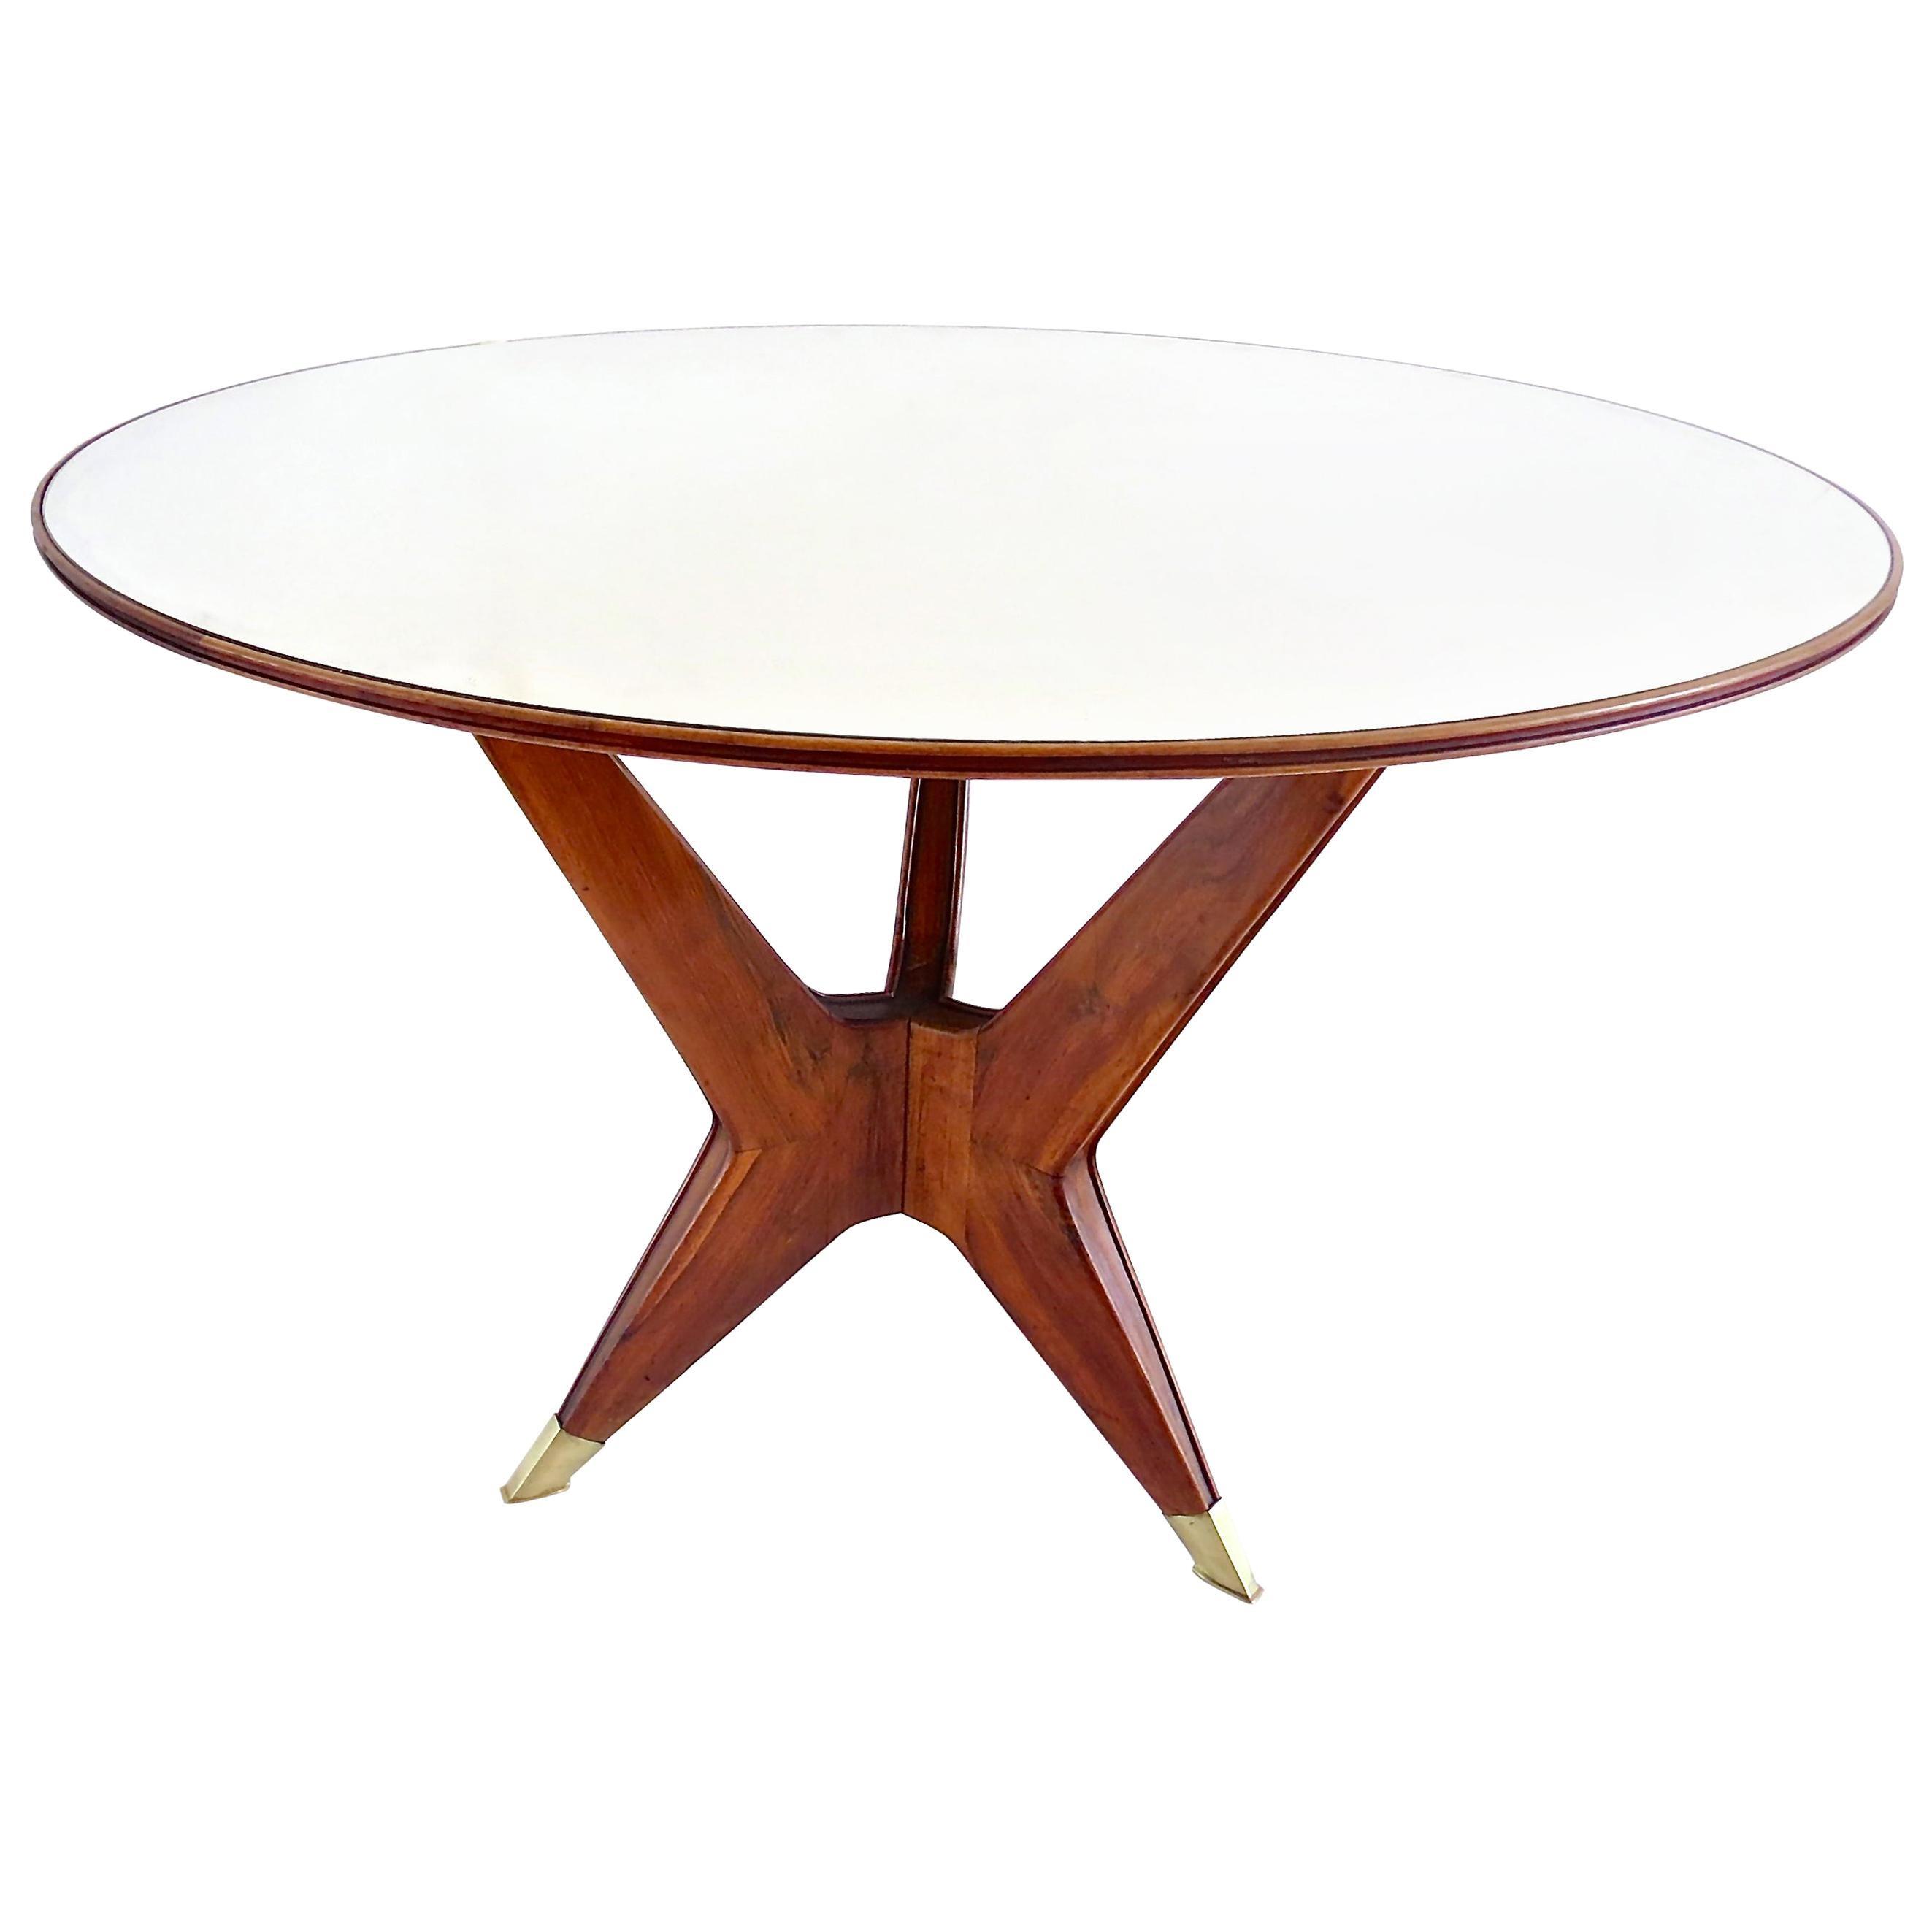 Ico Parisi Round Walnut Dining Table, Three Feet, 1950